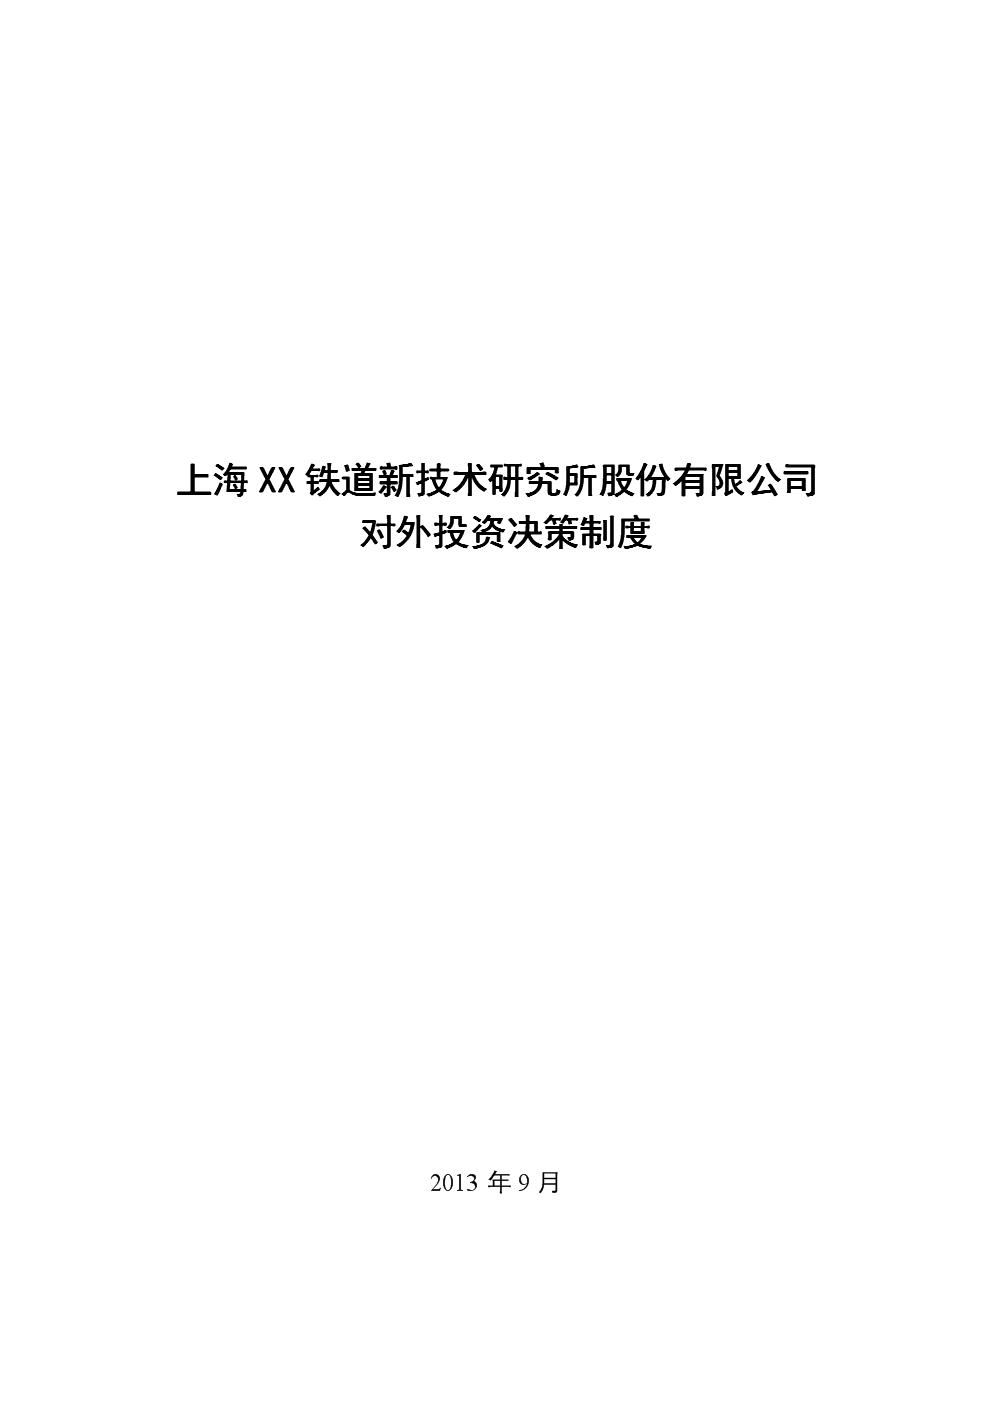 XX新技术研究所股份有限公司对外投资决策制度.doc